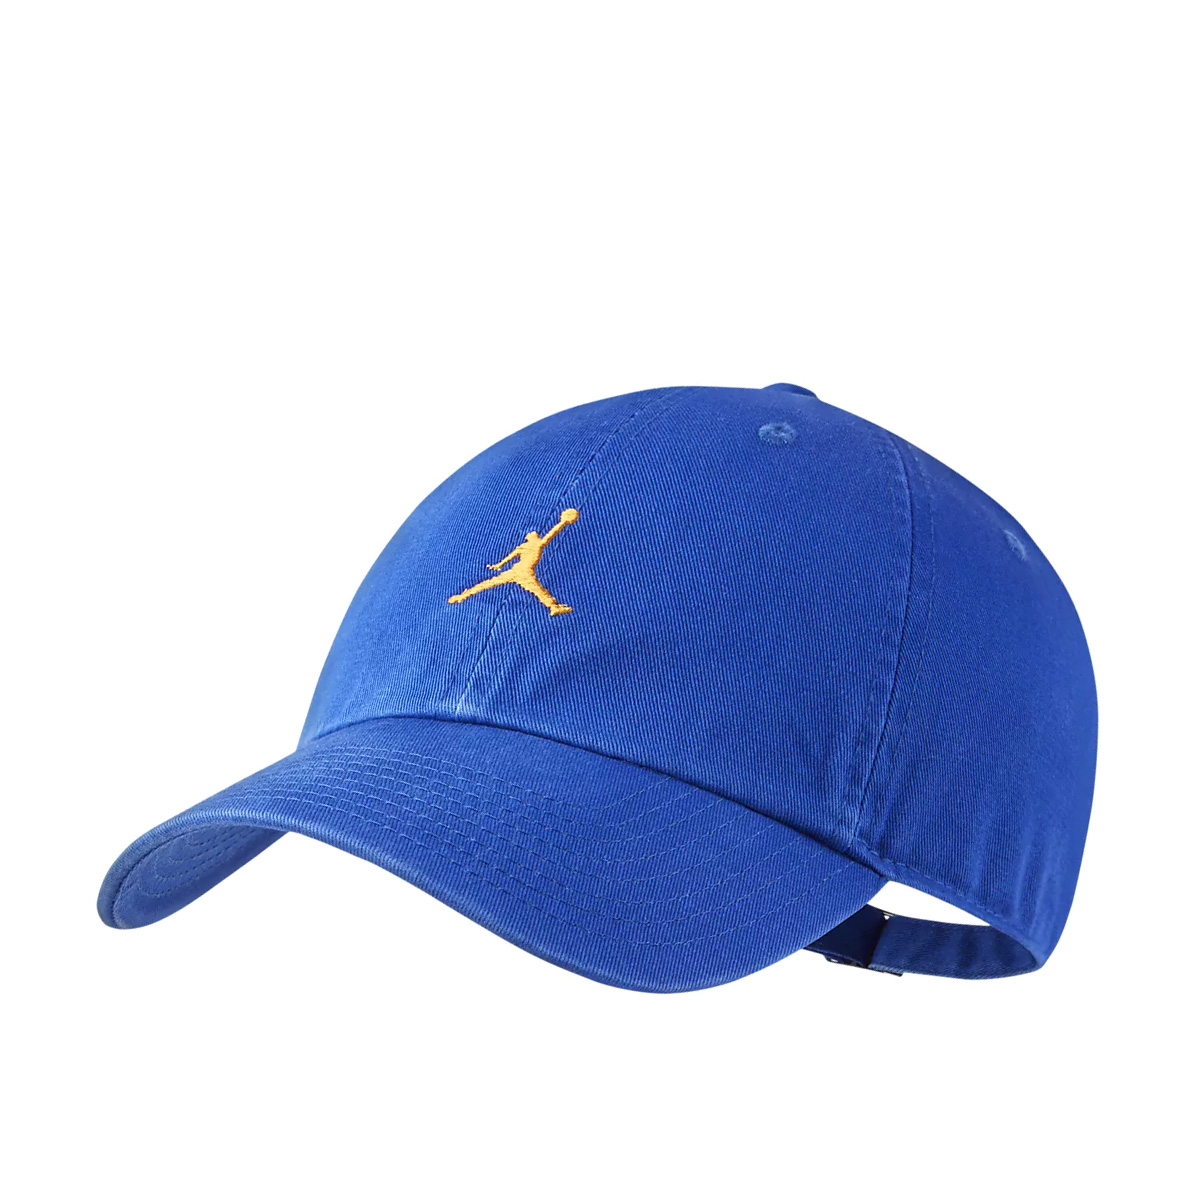 66aa1e7c549 ... coupon code nike heritage 86 jumpman floppy cap nike jordan heritage 86  jump man floppy cap